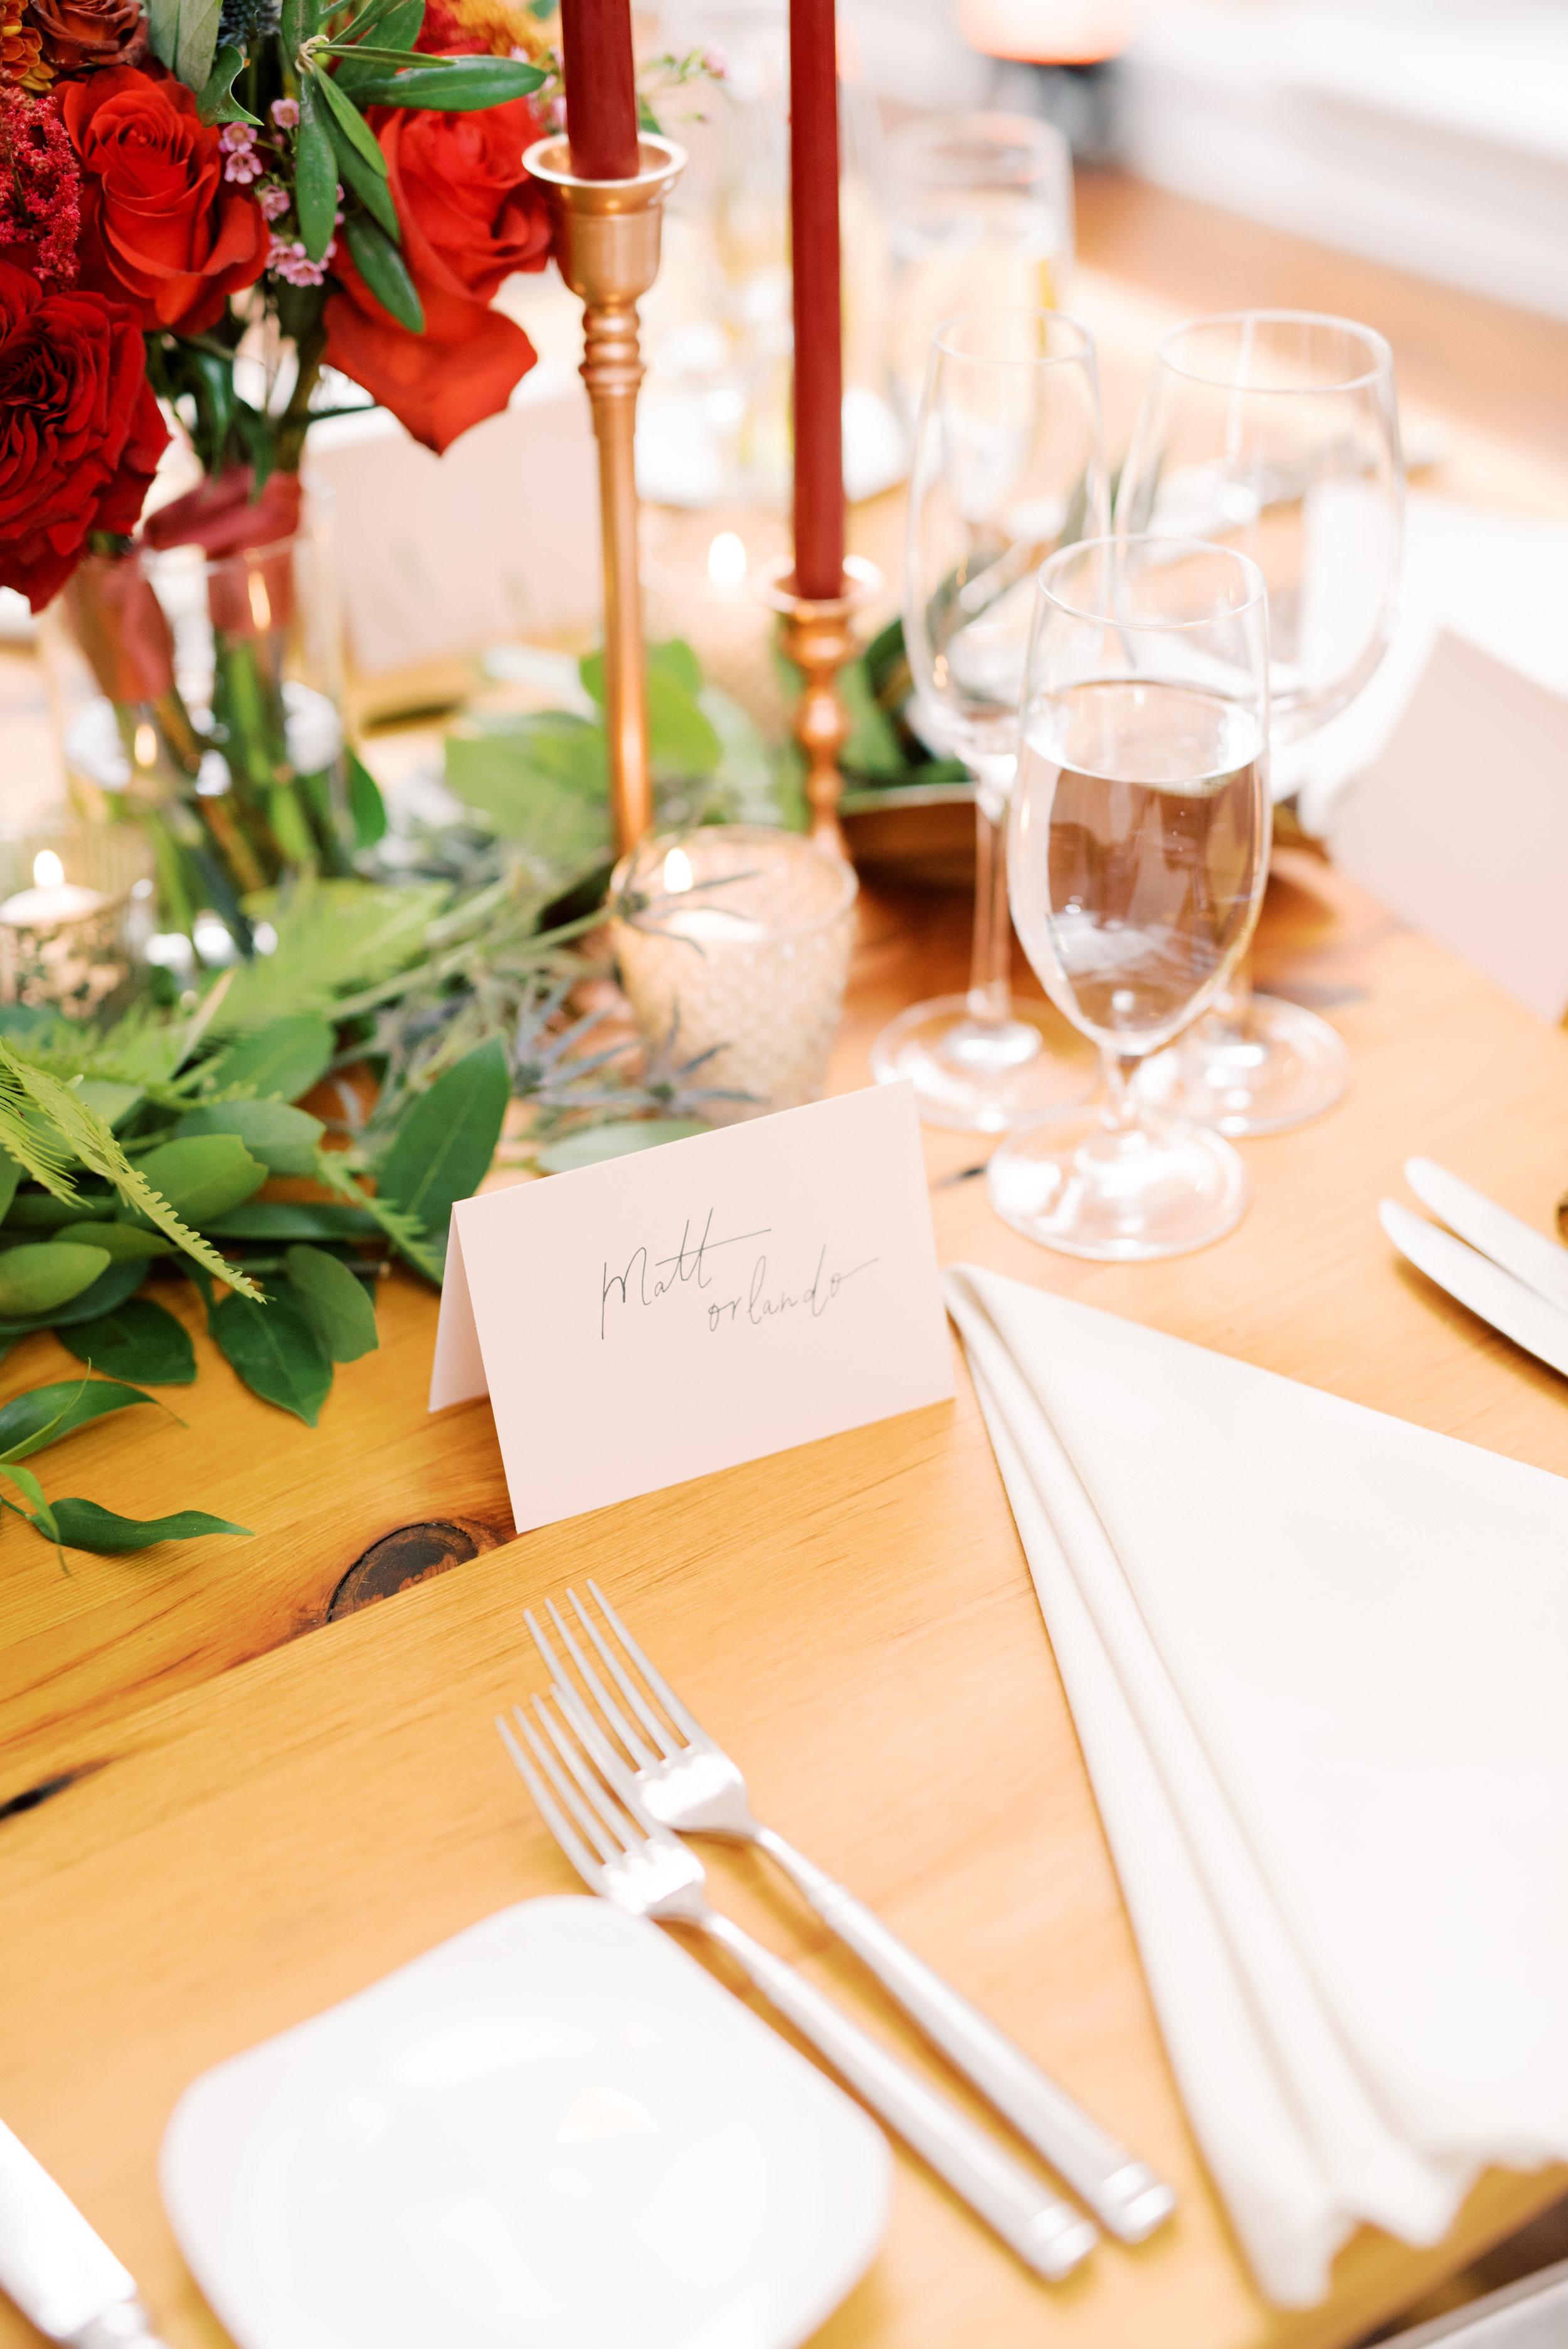 haley-richter-photography-october-pomme-wedding-in-radnor-081.jpg